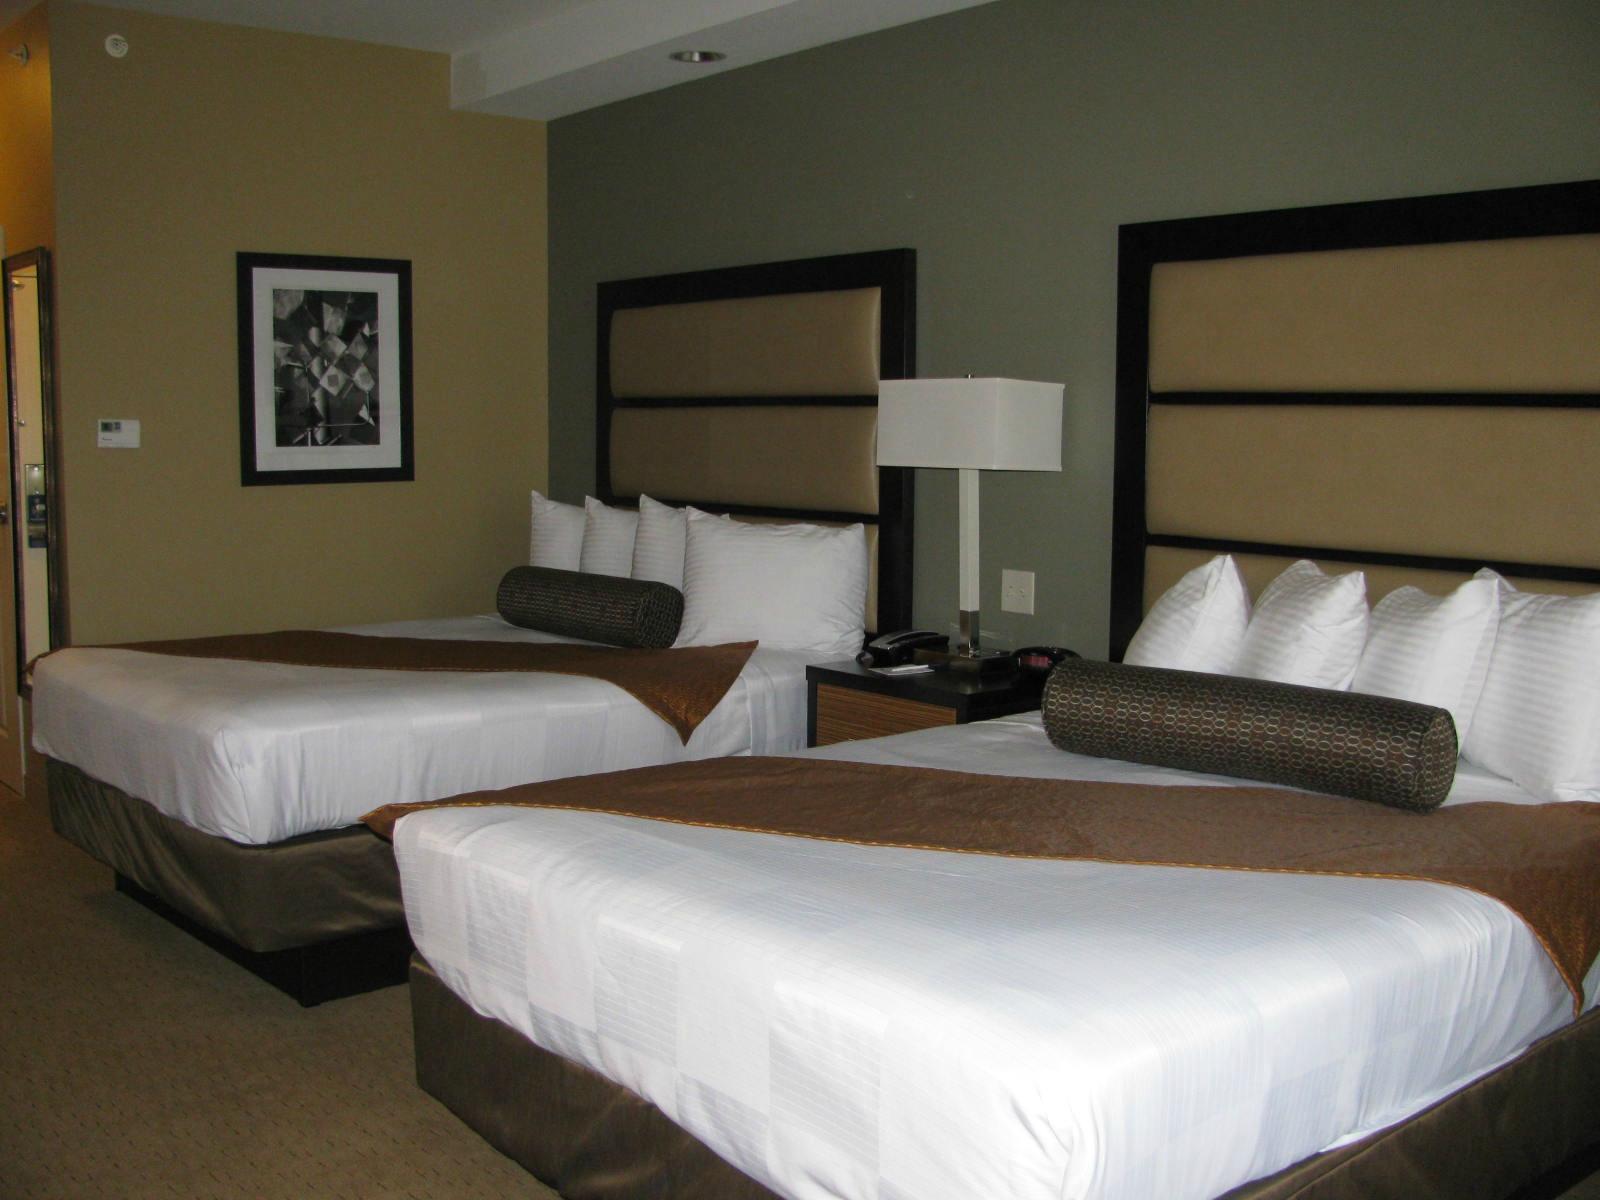 BEST WESTERN PLUS College Park Hotel